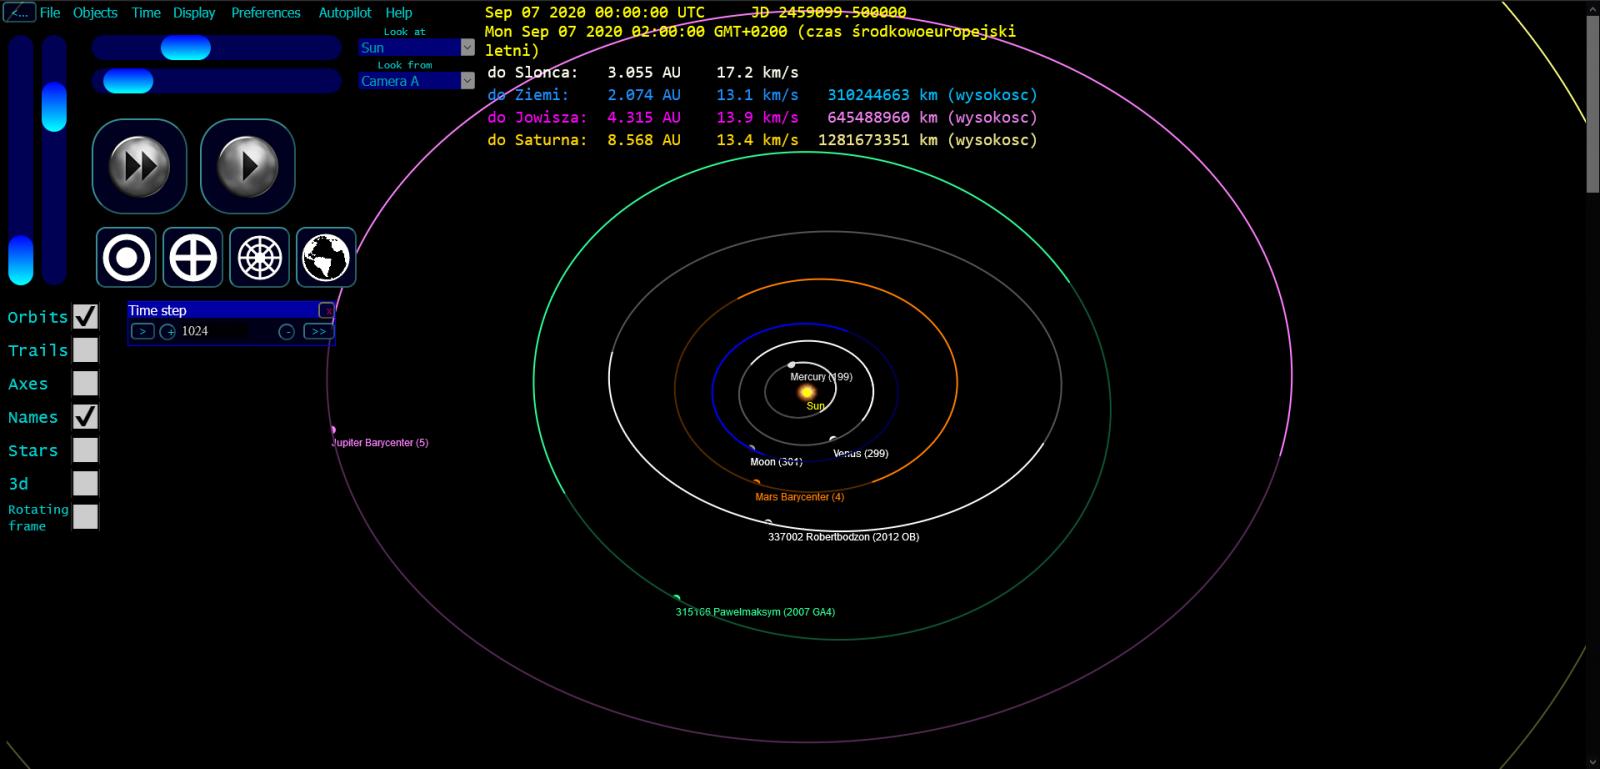 orbity.png